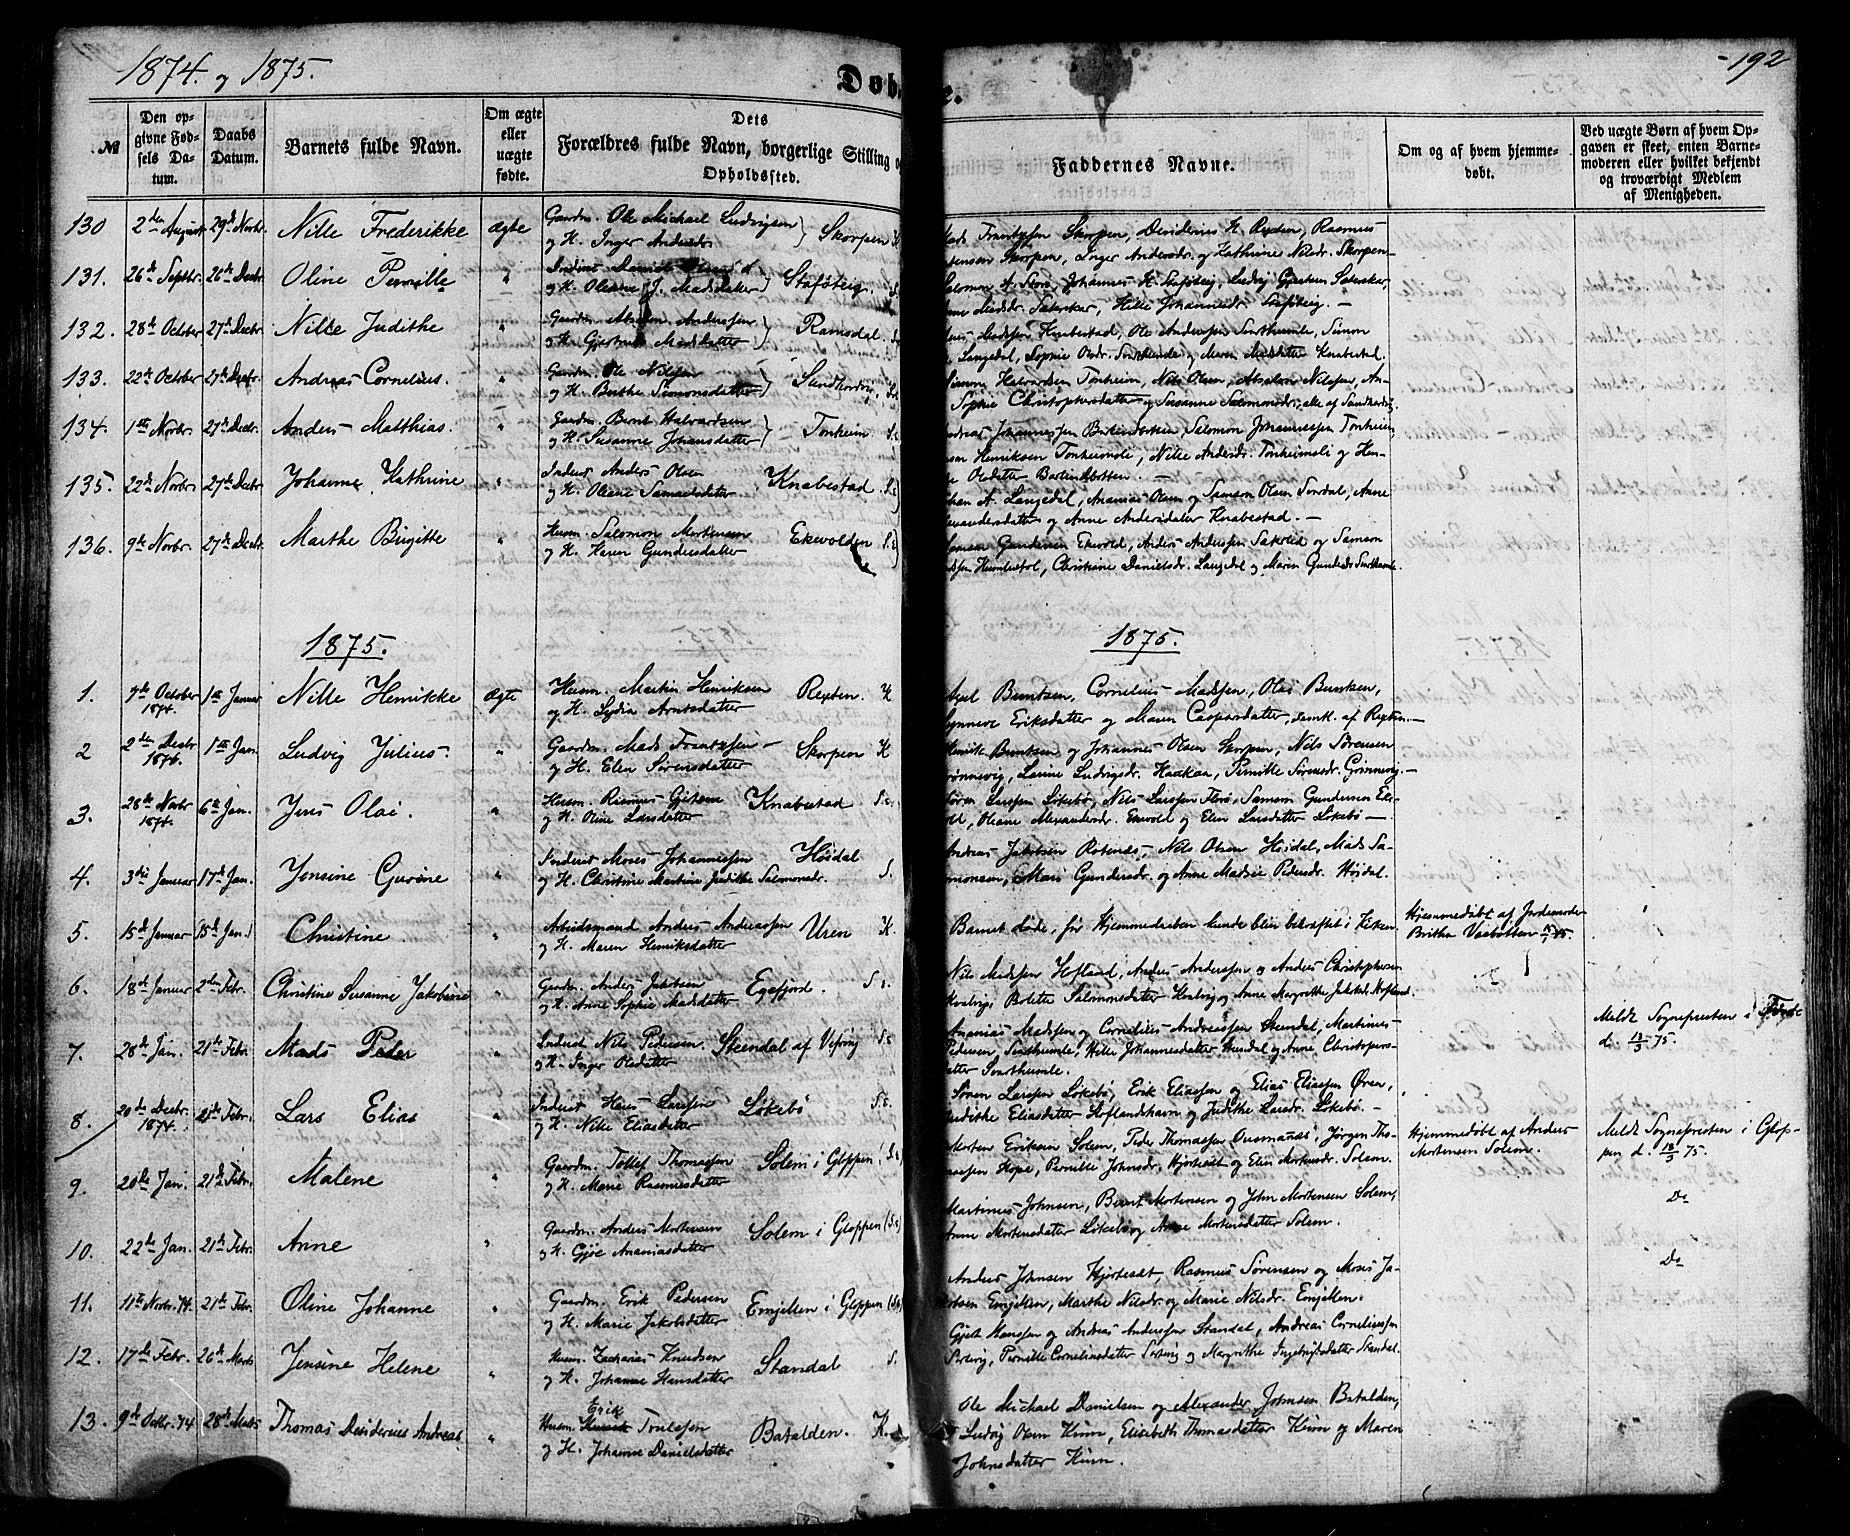 SAB, Kinn sokneprestembete, H/Haa/Haaa/L0006: Ministerialbok nr. A 6, 1857-1885, s. 192